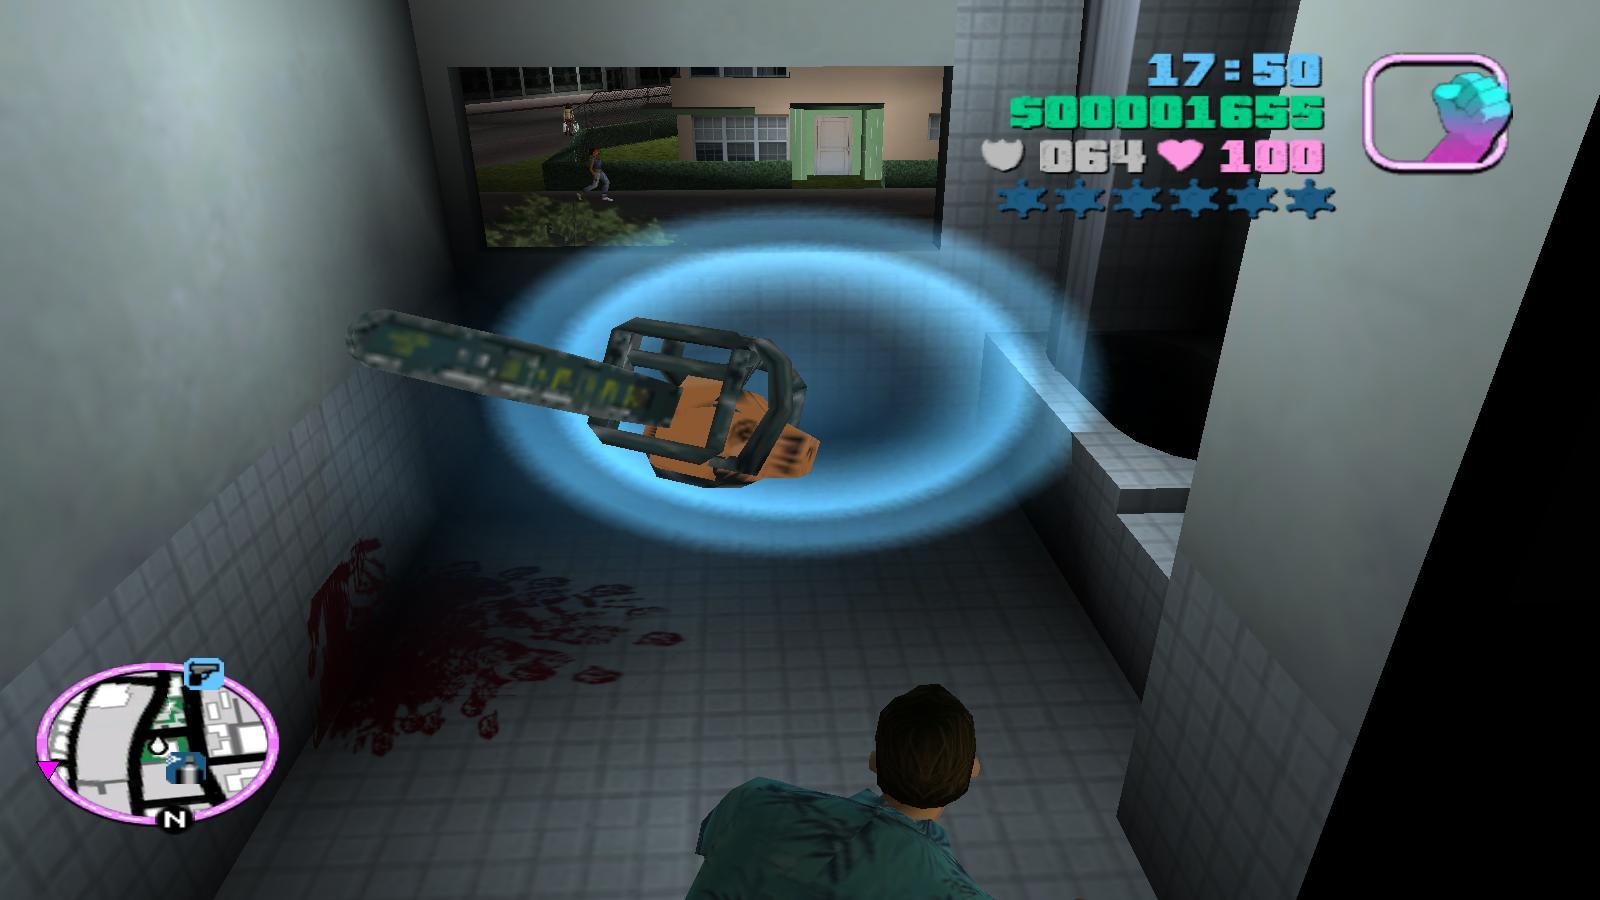 gta-vc 2011-08-05 16-17-48-52.jpg - Grand Theft Auto: Vice City